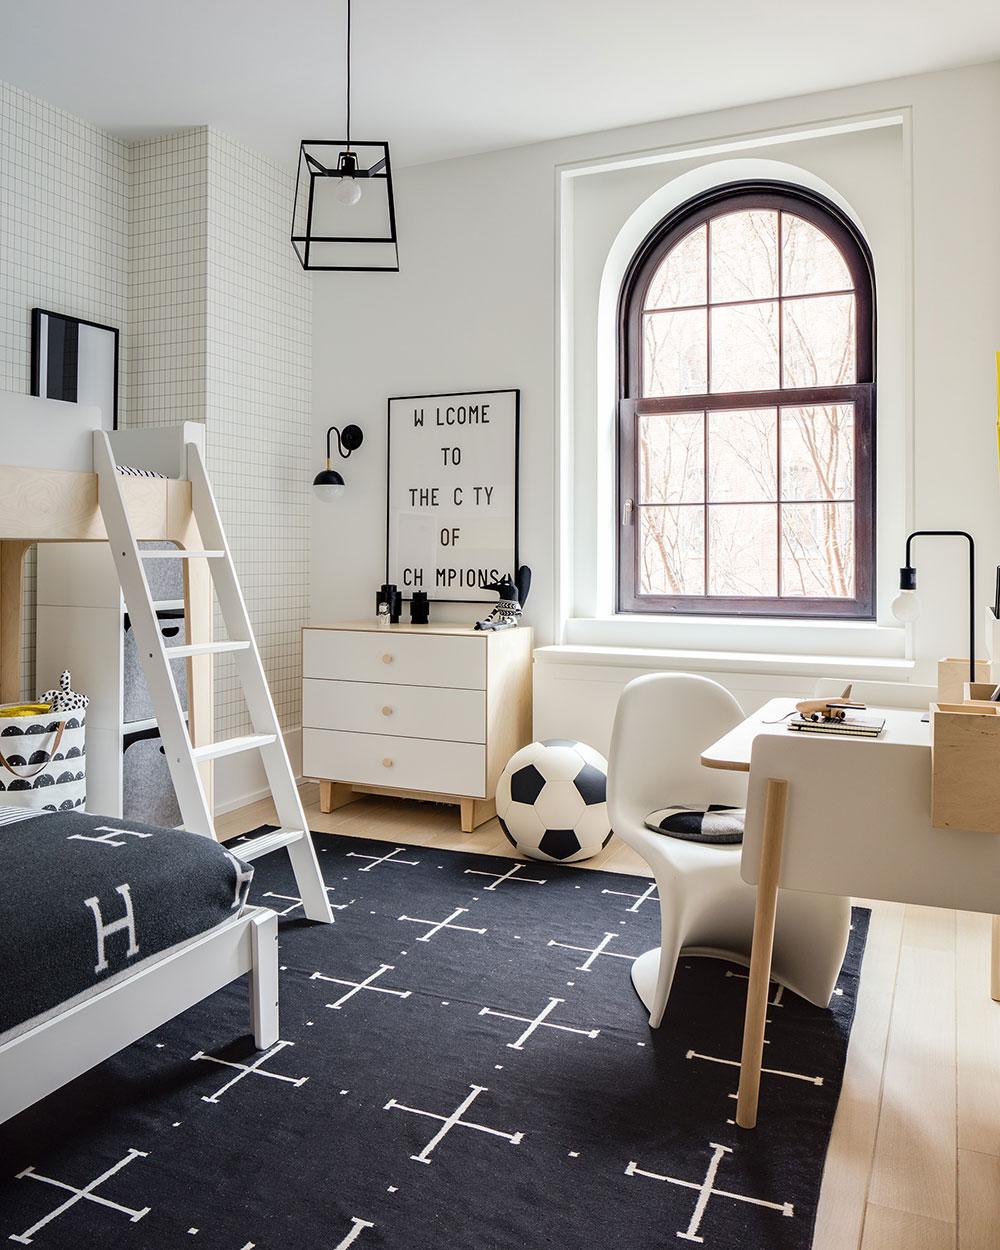 Designing Modern New York Style Kids Room By Sissy Marley Foto Idei Dizajn